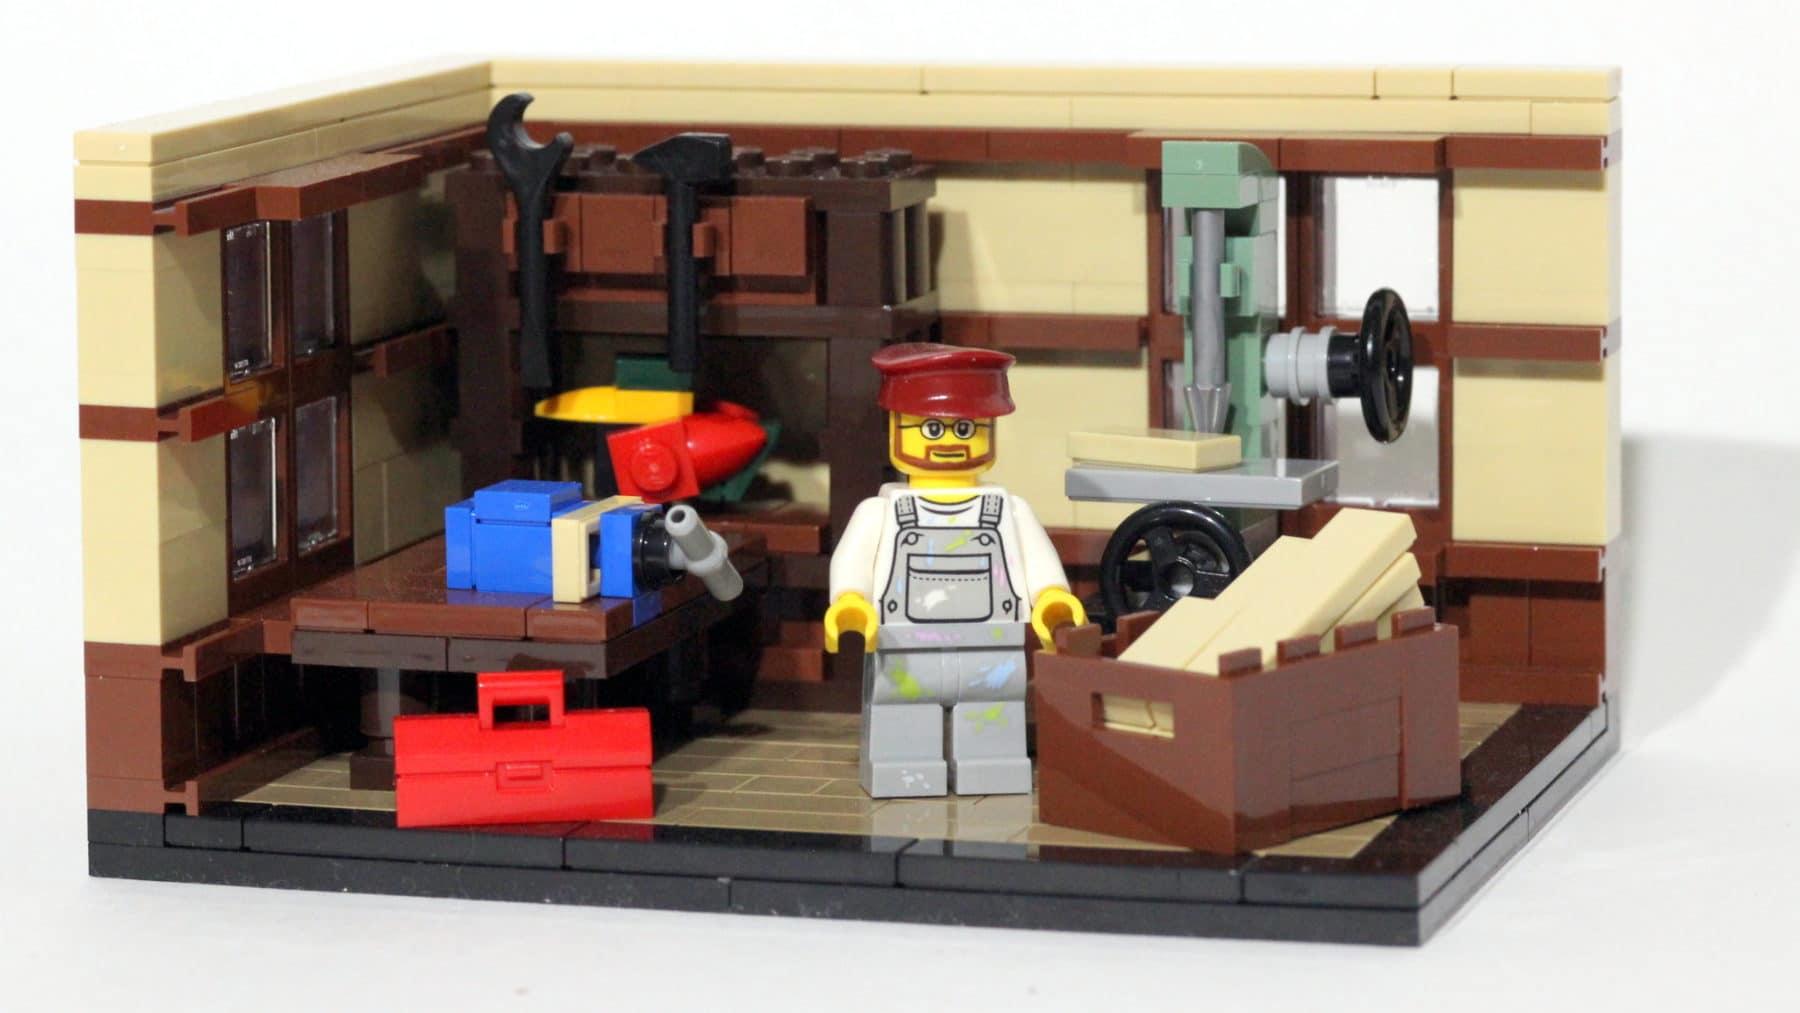 The LEGO Story: Tischlerwerkstatt